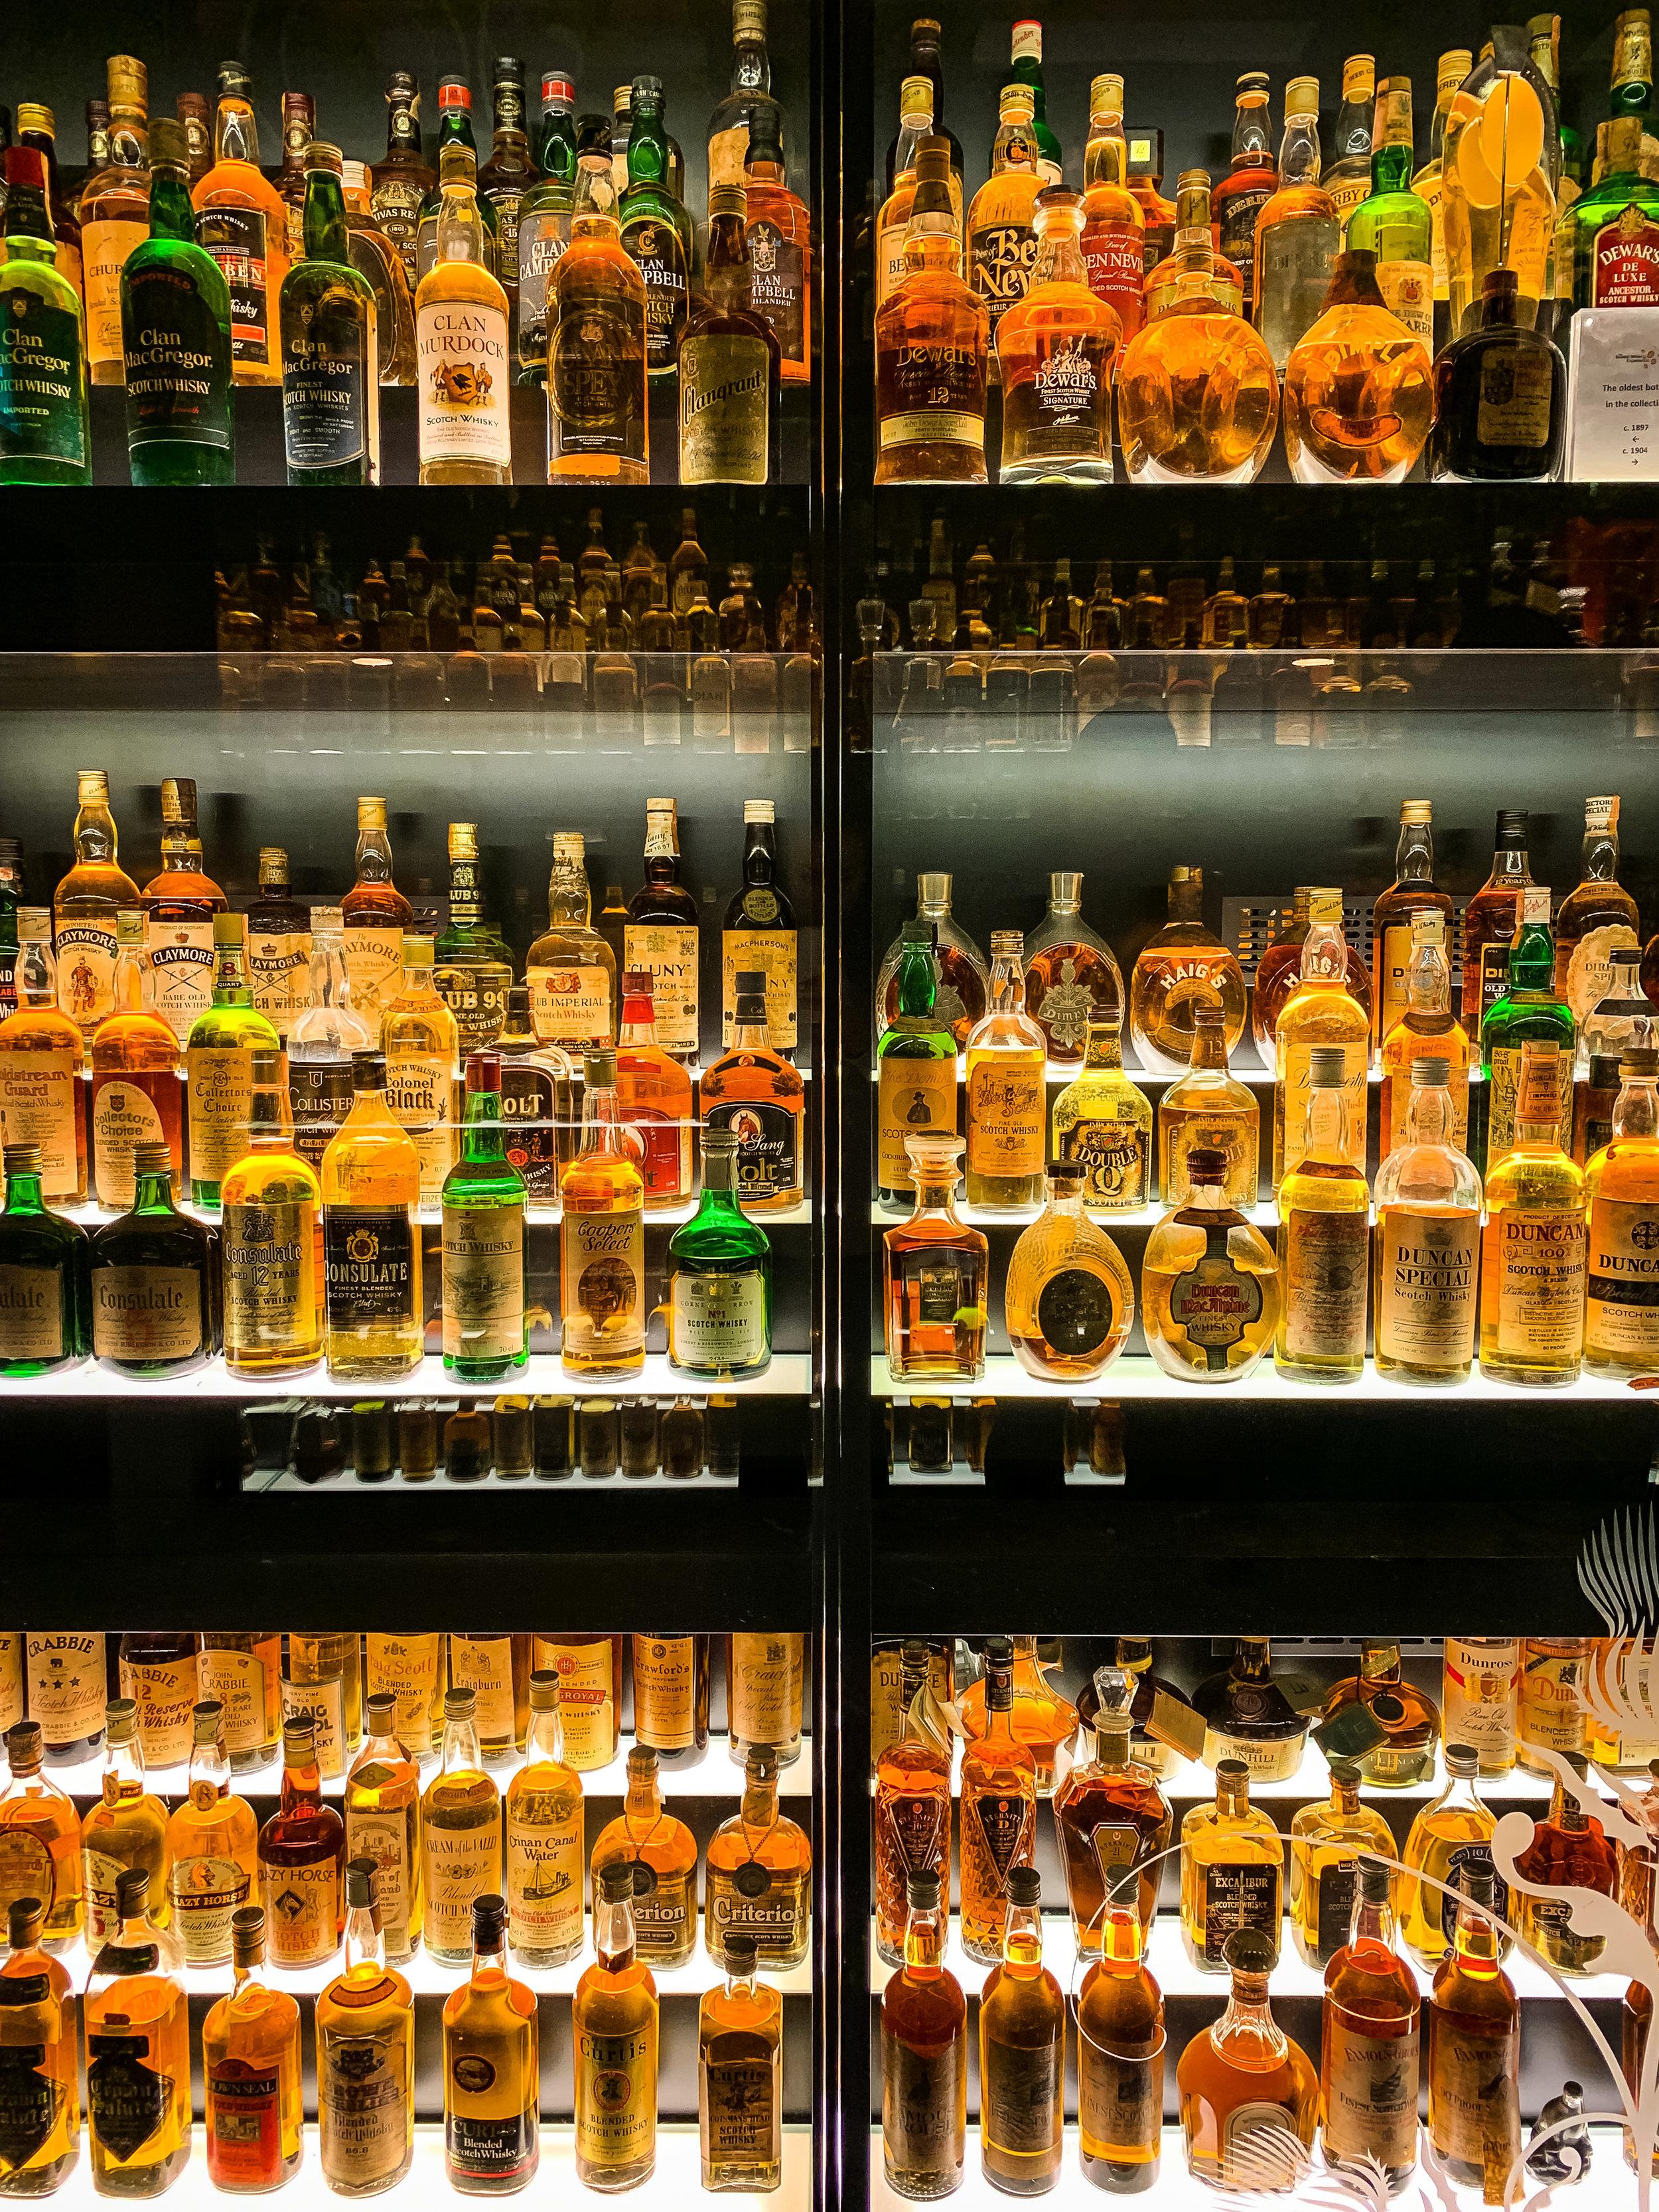 LSS Scotch Whisky Experience Edinburgh Scotland